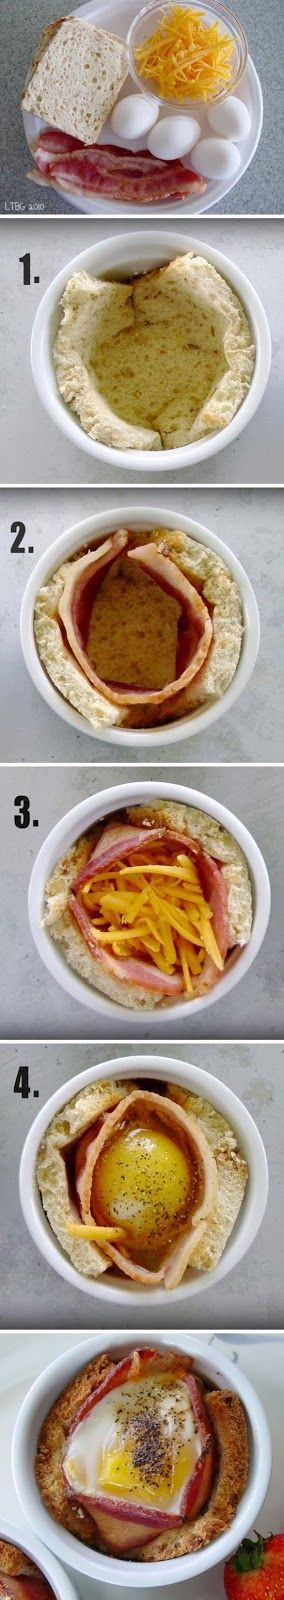 Breakfast In A Cup